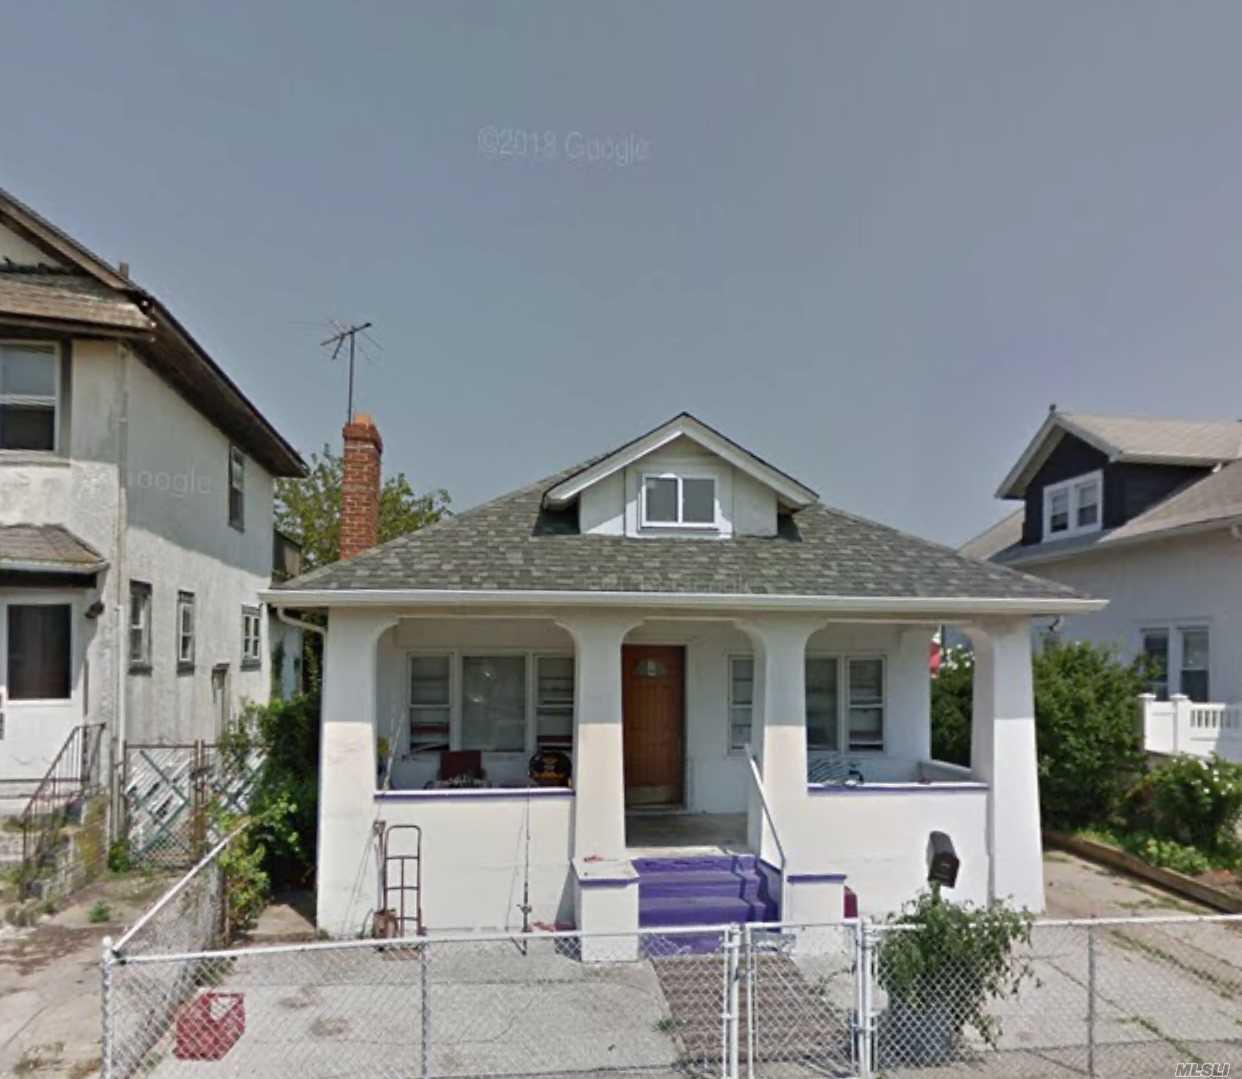 Property for sale at 161 W Hudson Street, Long Beach NY 11561, Long Beach,  New York 11561